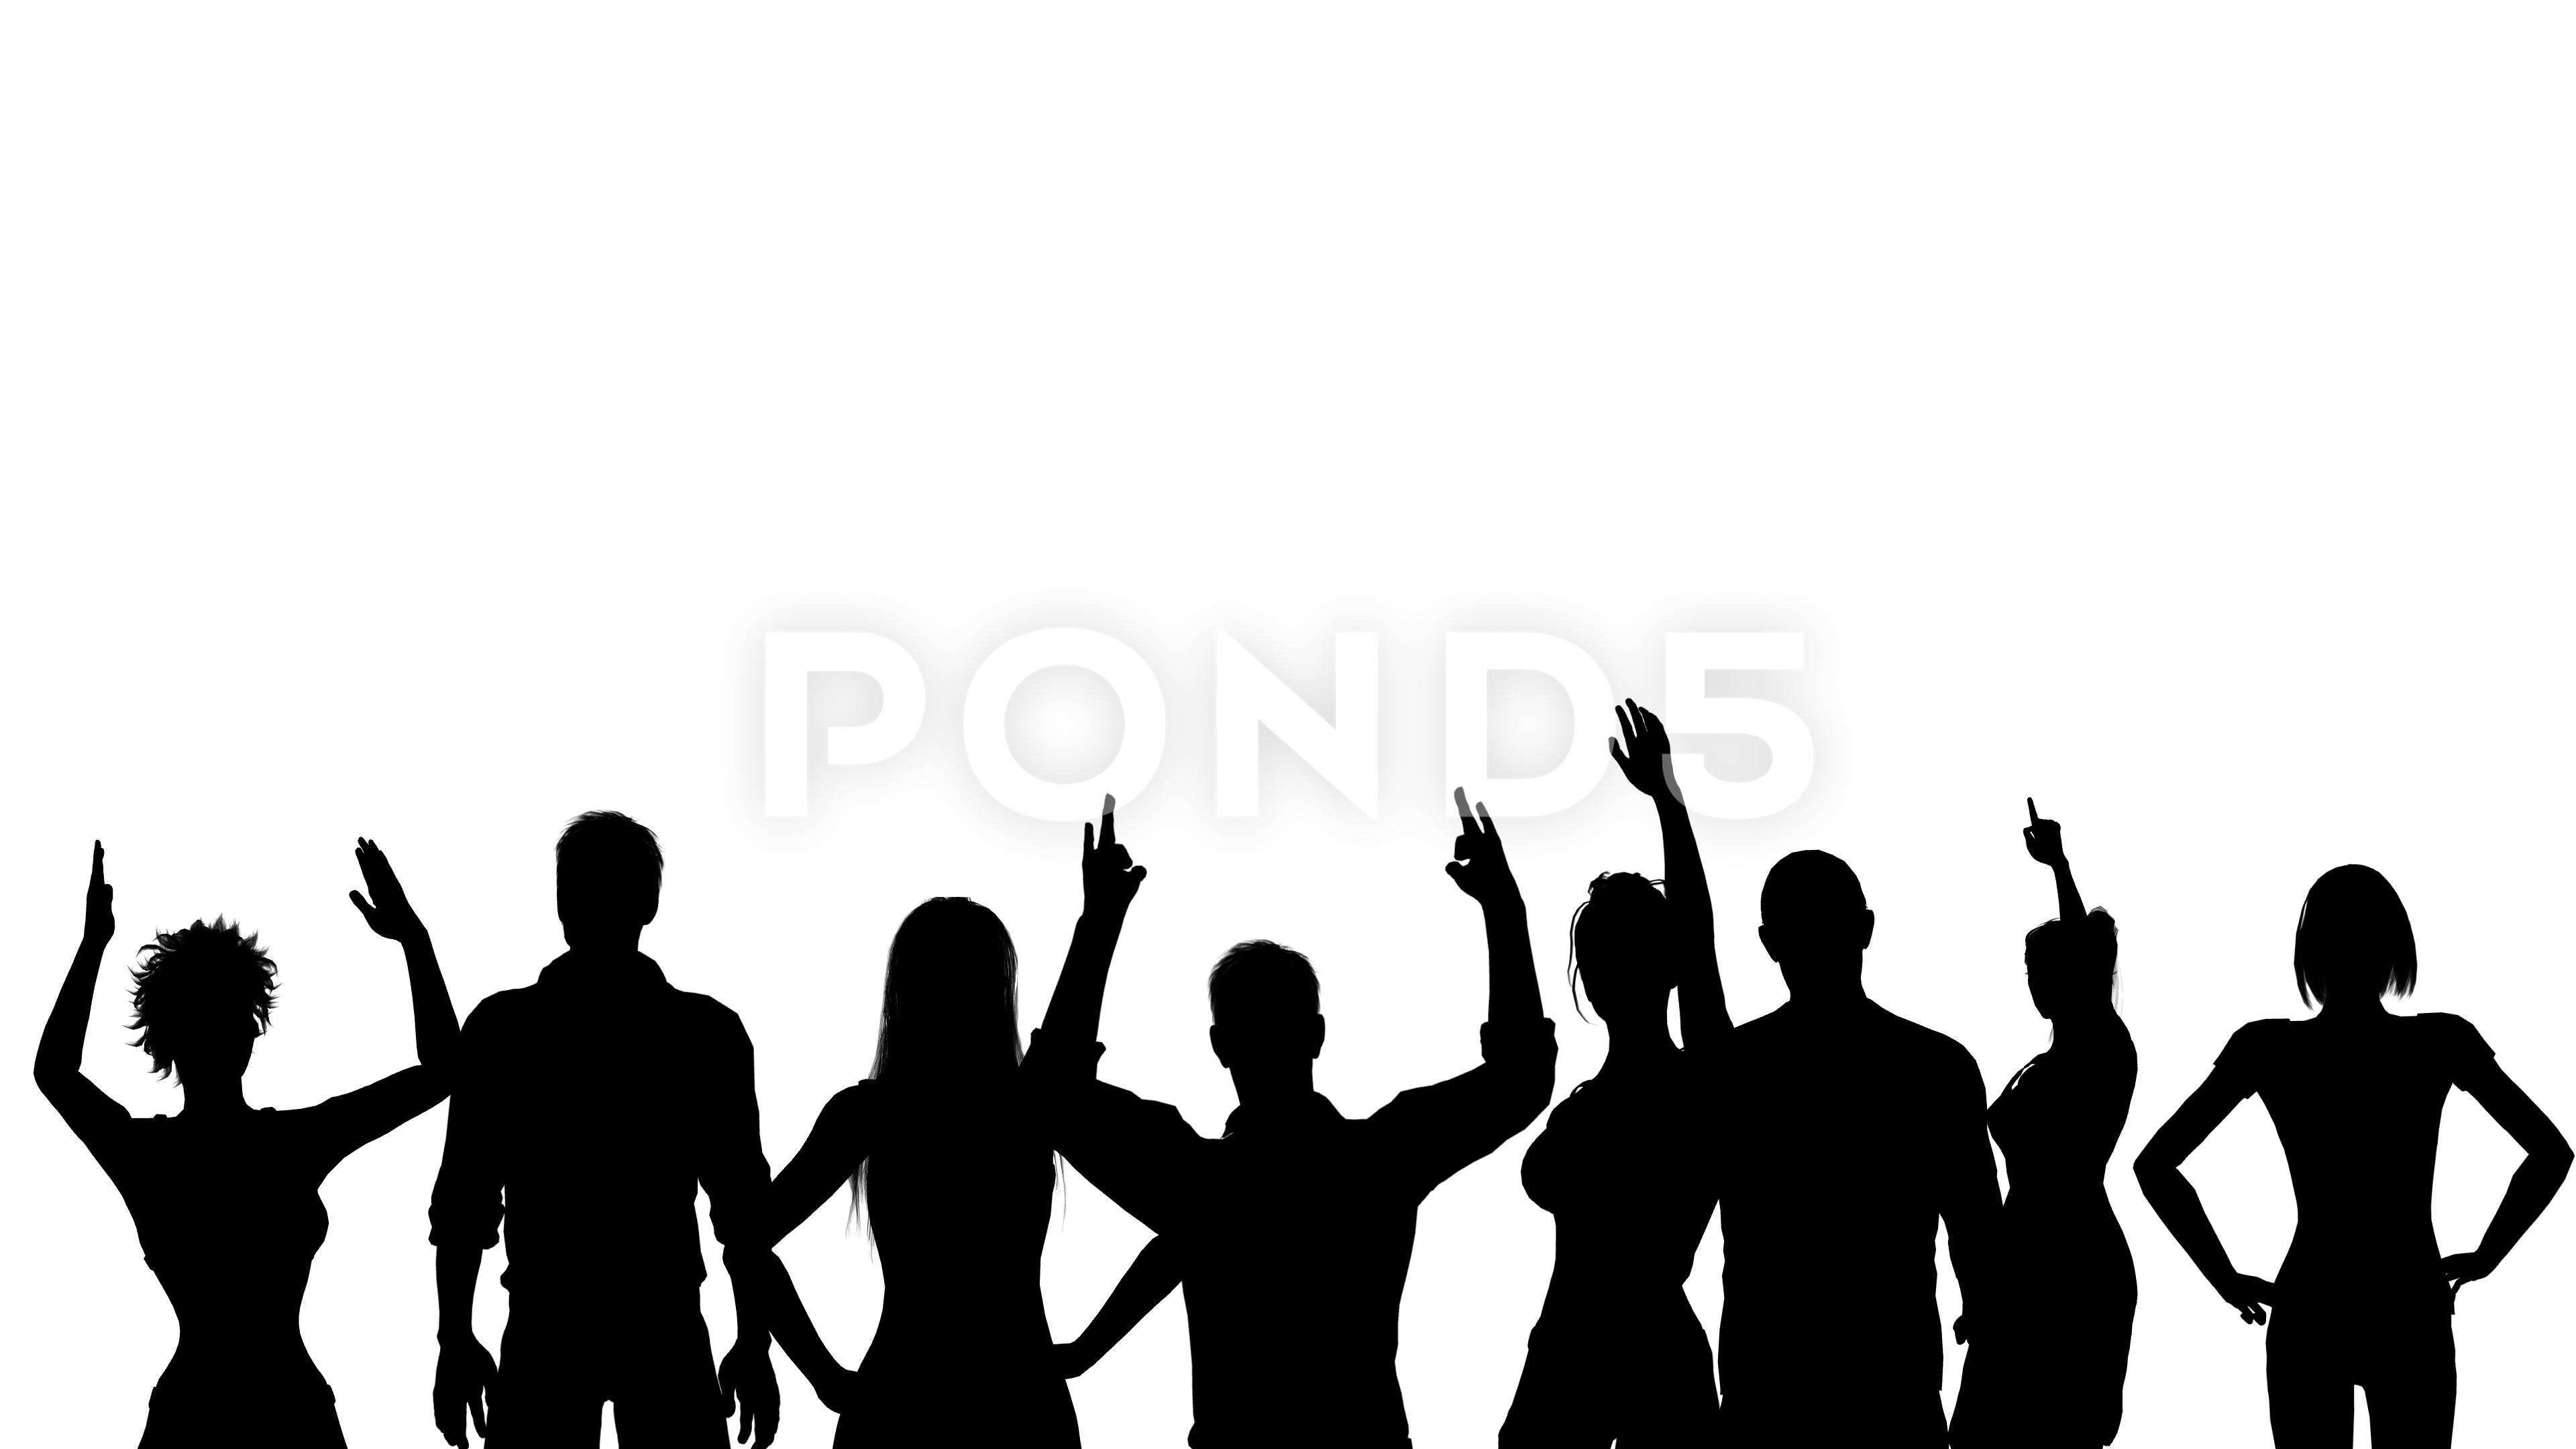 3840x2160 Black Silhouettes Of Cheering Fans. Alpha Channel. Alpha Matte. 4k